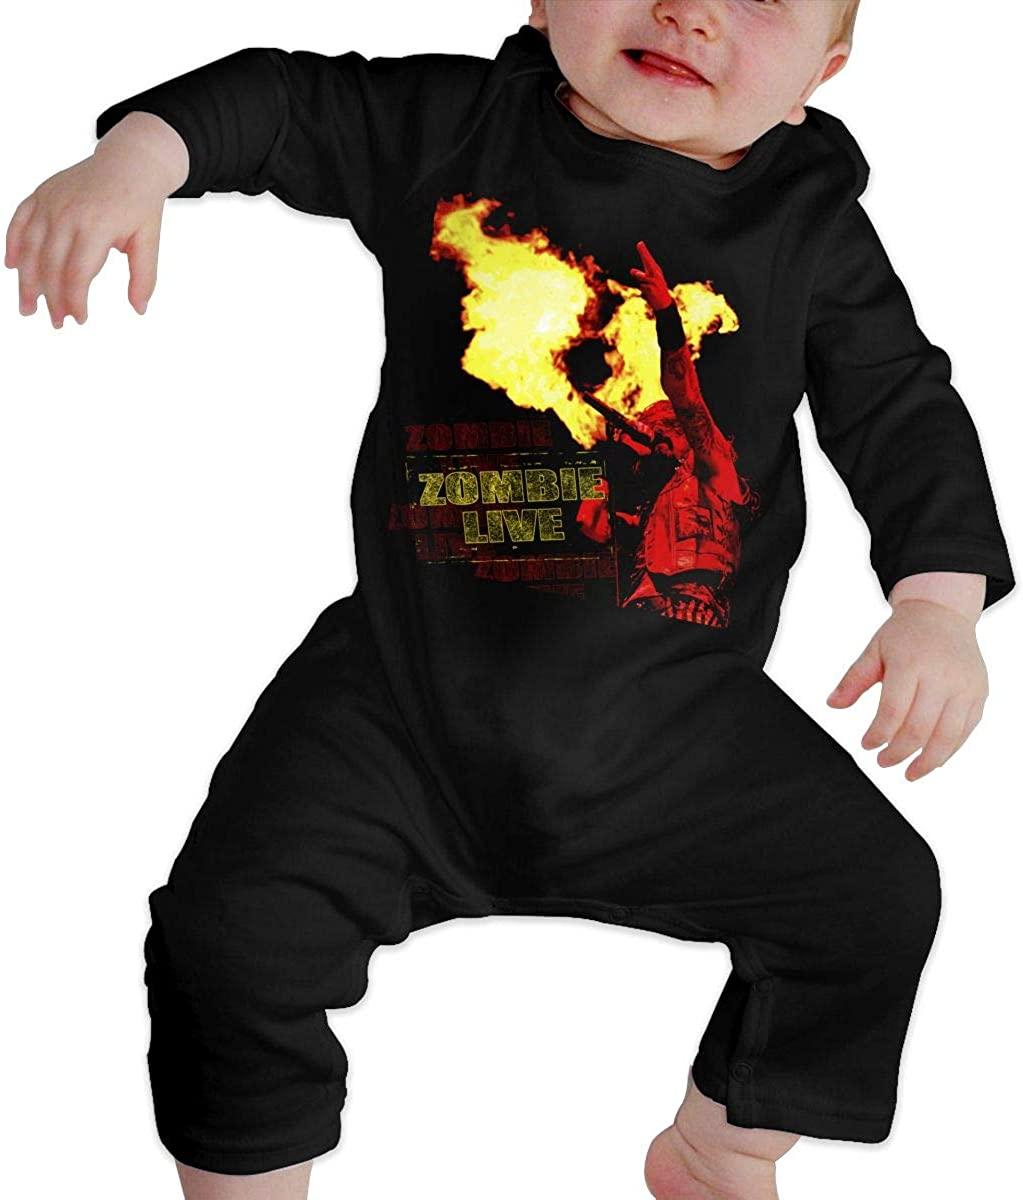 Watkinsmarket Rob Zombie Baby Boy Girl Jumpsuit Jumpsuit Baby Newborn Cotton Long Sleeve Jumpsuit Black